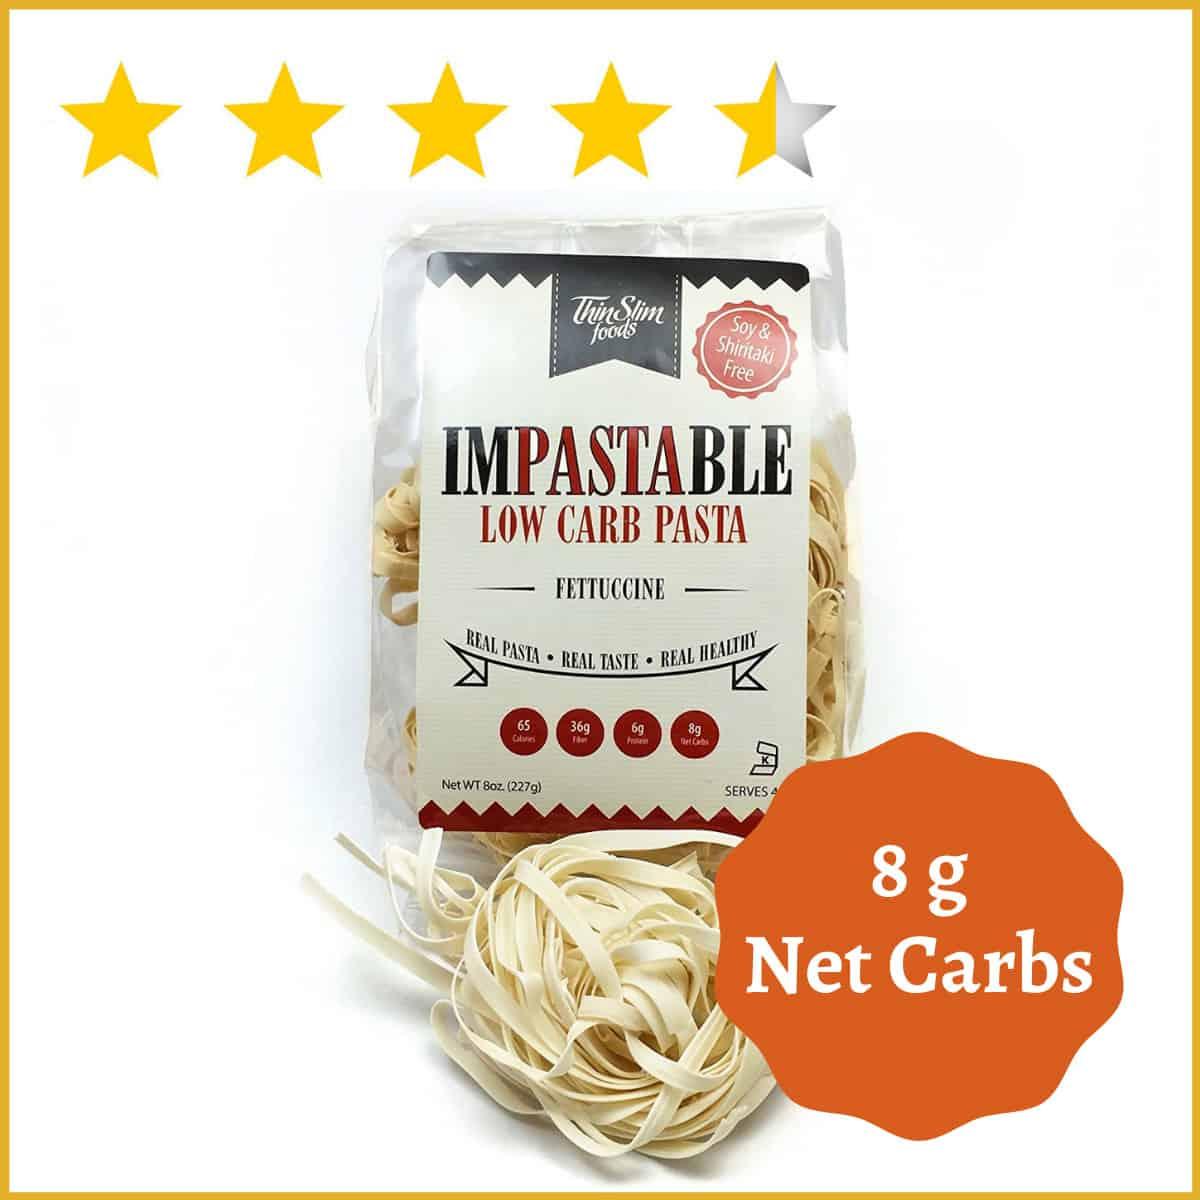 ThinSlim Foods Impastable Low Carb Pasta Fettuccine